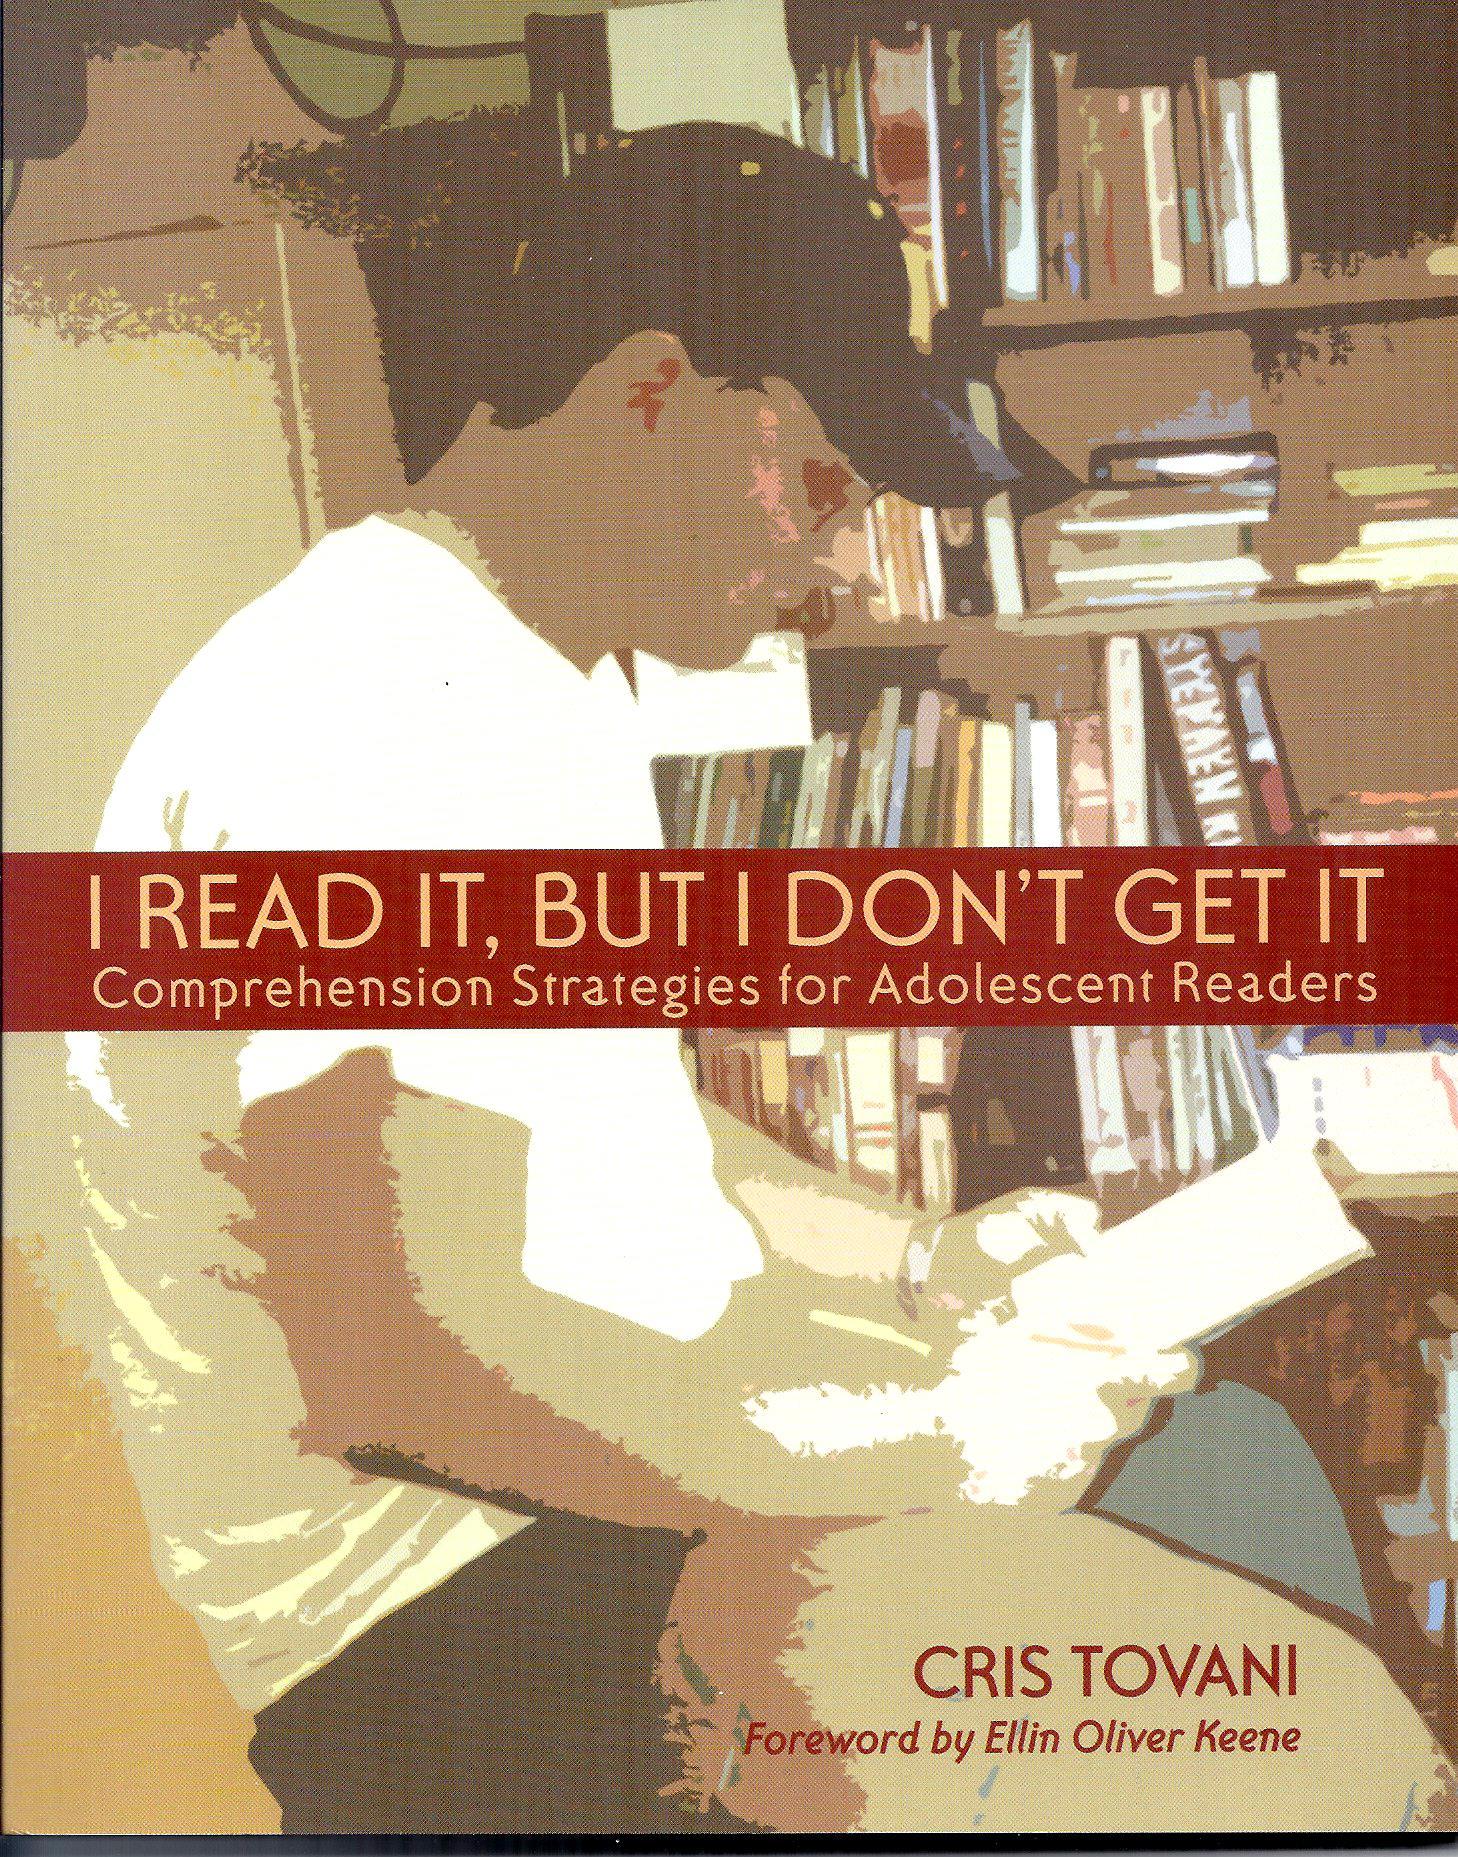 I read it, but I don't get it.-0